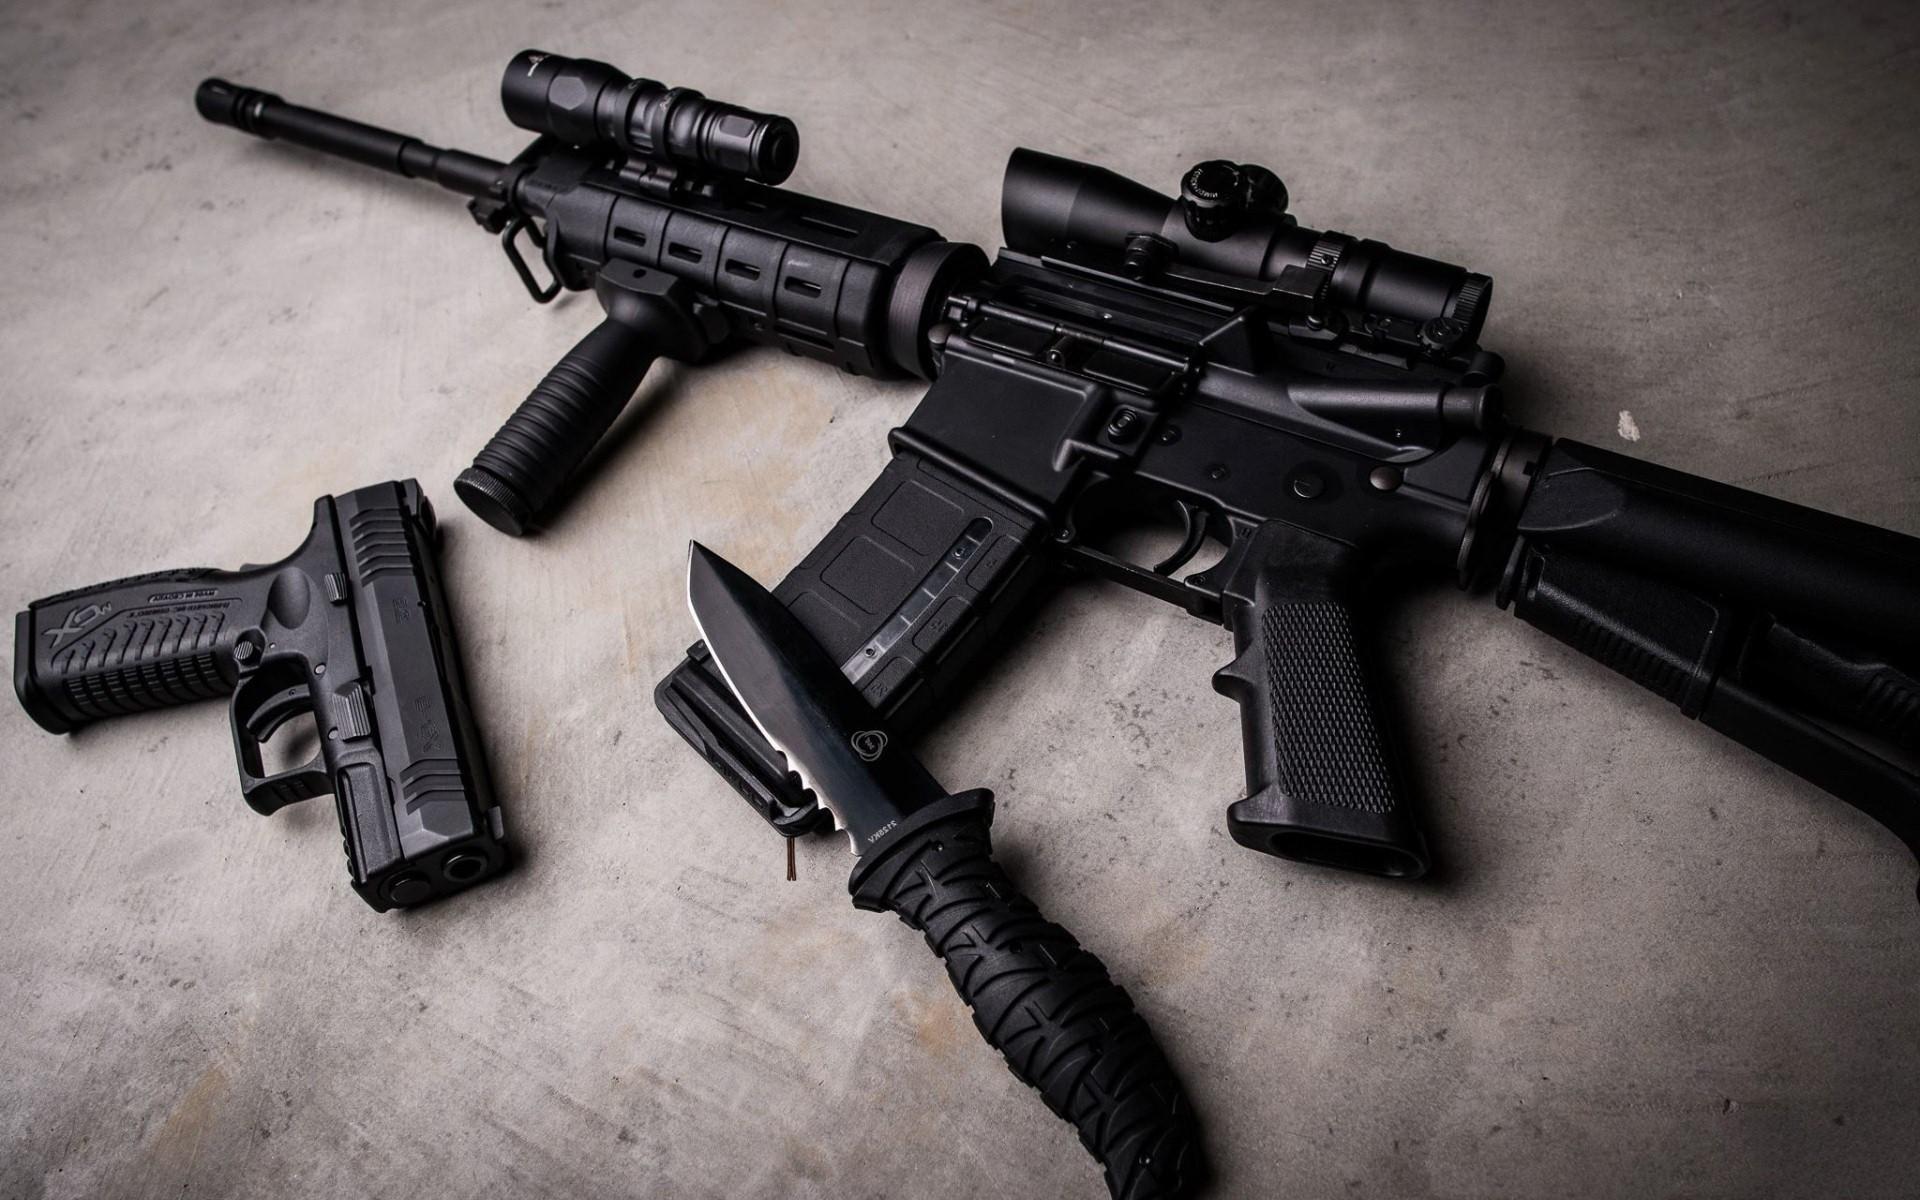 AK 47 Pistol and Knife Black Weapons HD Desktop Wallpaper